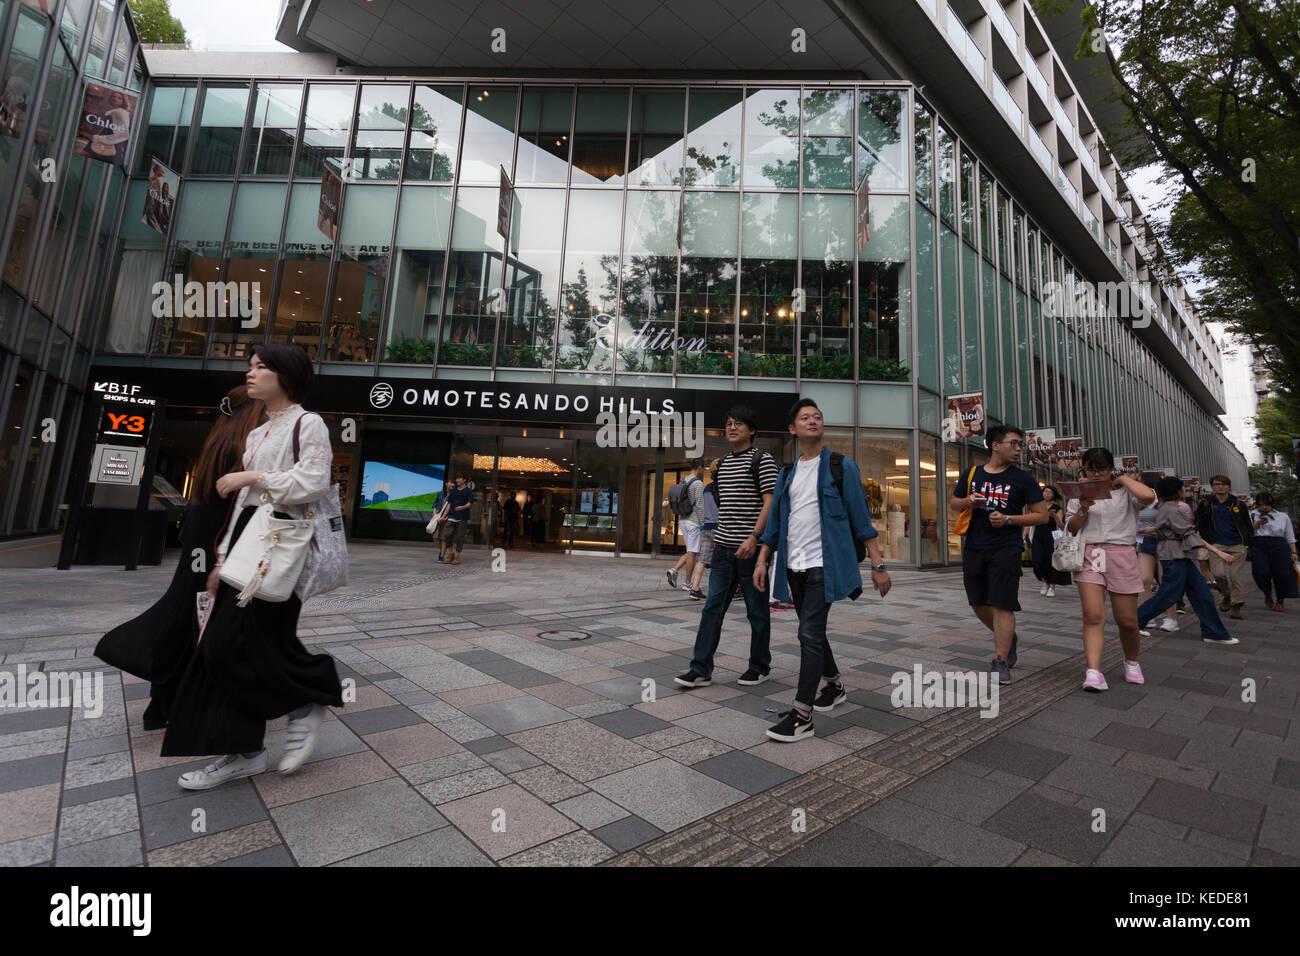 Shopper walk in front of Omotesando Hills in Omotesando, Tokyo, Japan Friday September 15th 2017 - Stock Image